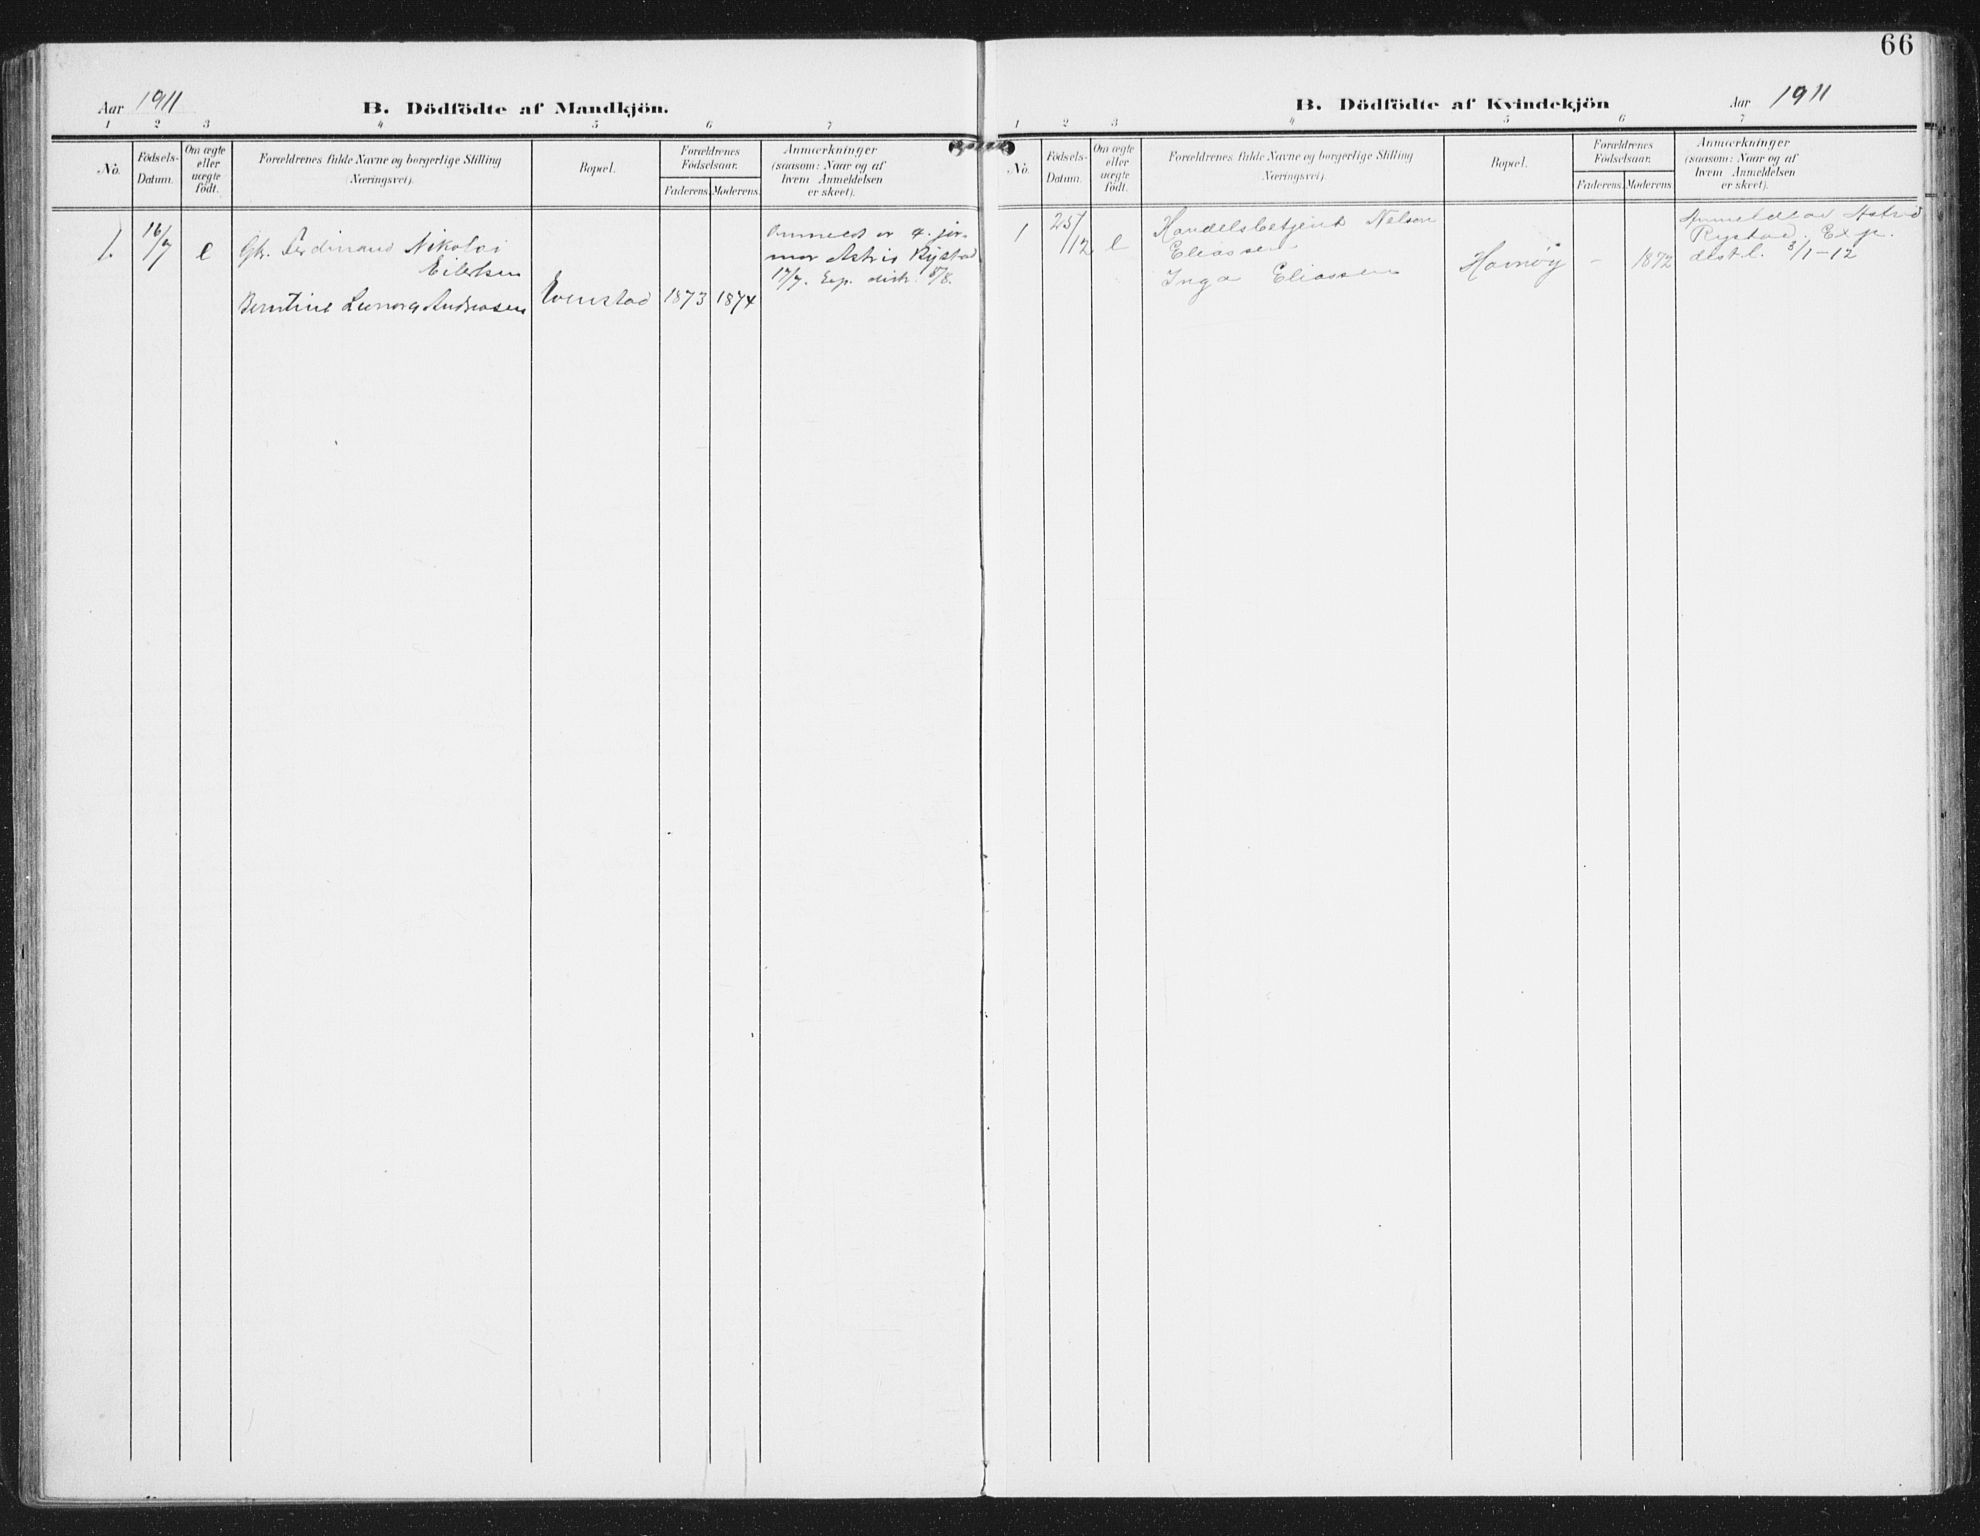 SAT, Ministerialprotokoller, klokkerbøker og fødselsregistre - Nordland, 886/L1221: Ministerialbok nr. 886A03, 1903-1913, s. 66